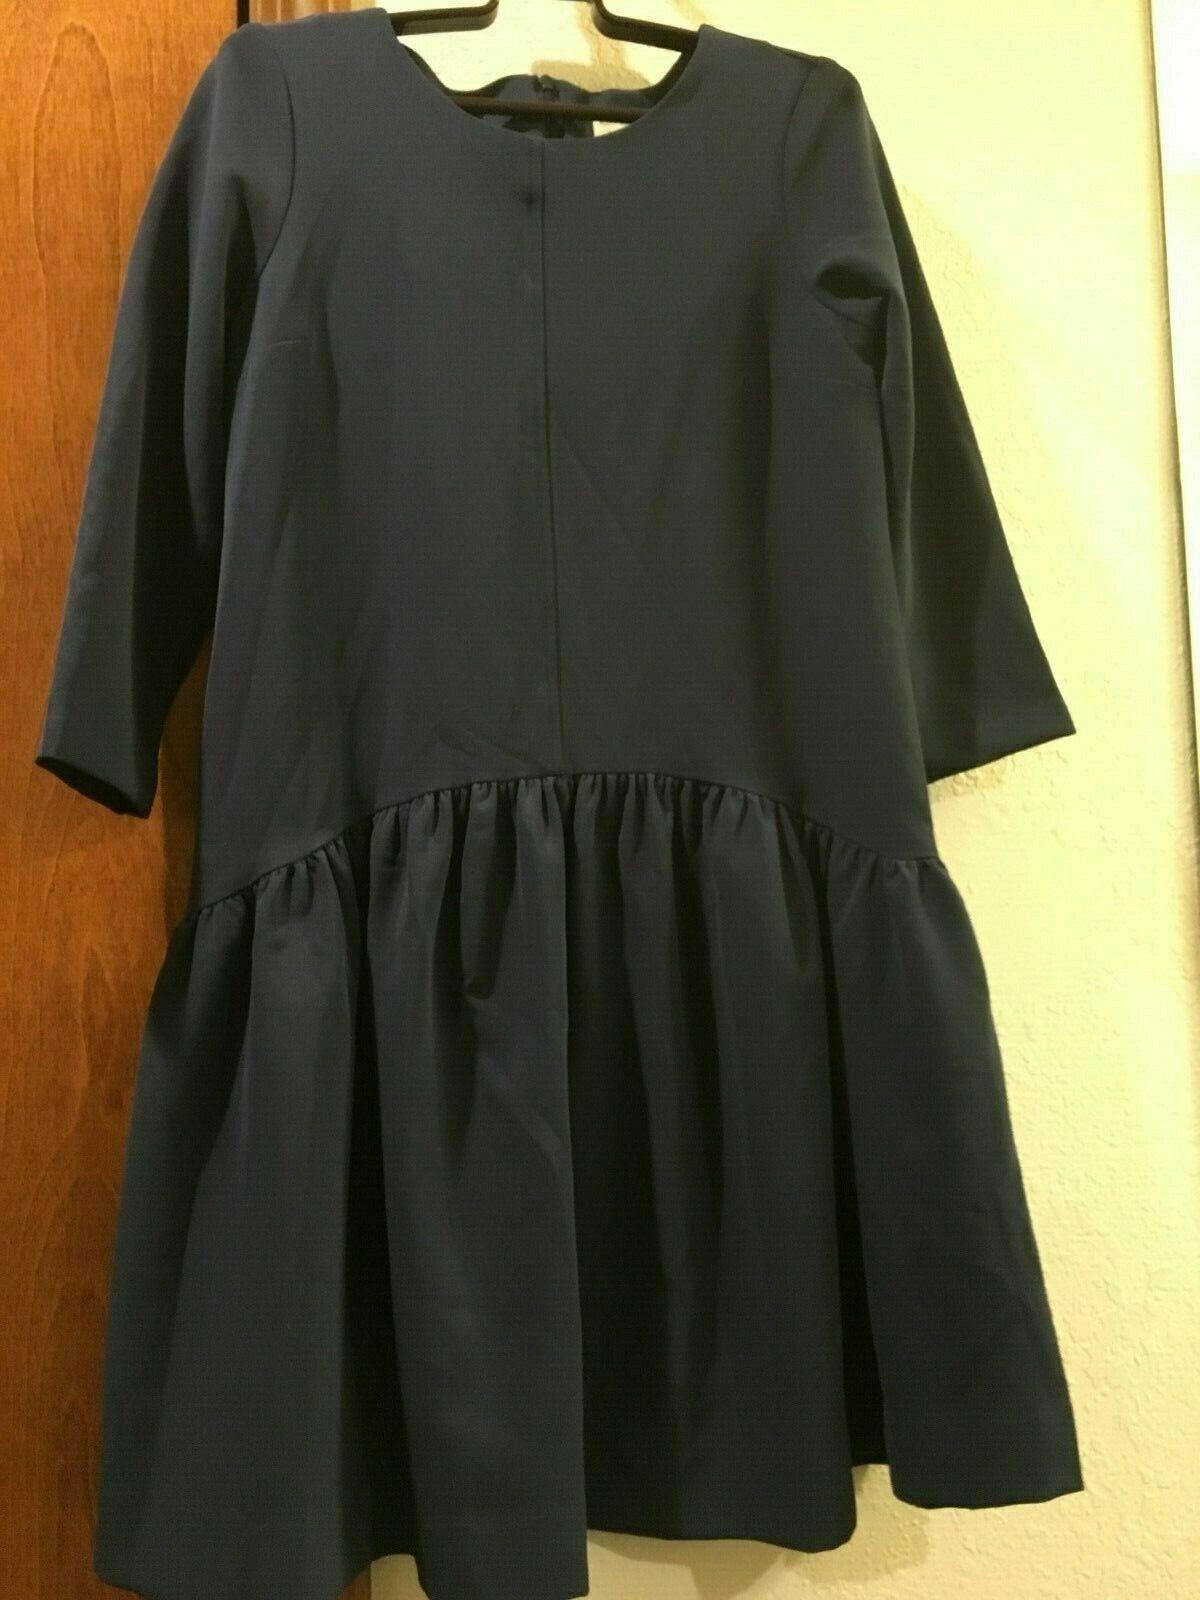 Kim Proper San Francisco Mauve Dress damen Größe S Pleat Waist Modern Cut Stylish